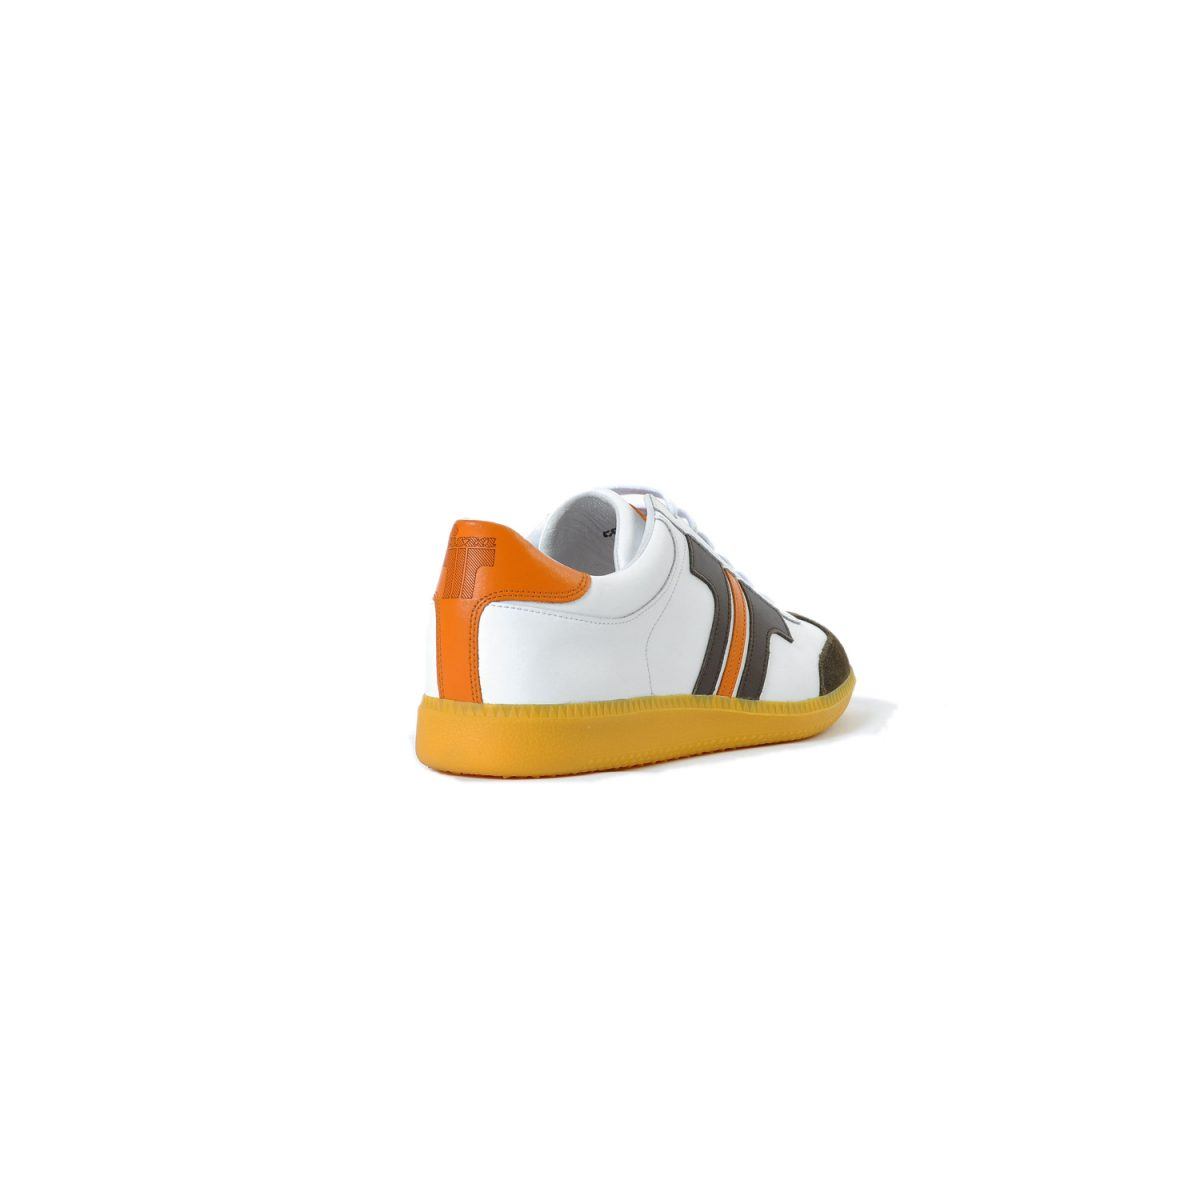 Tisza shoes - Compakt - White-brown-orange